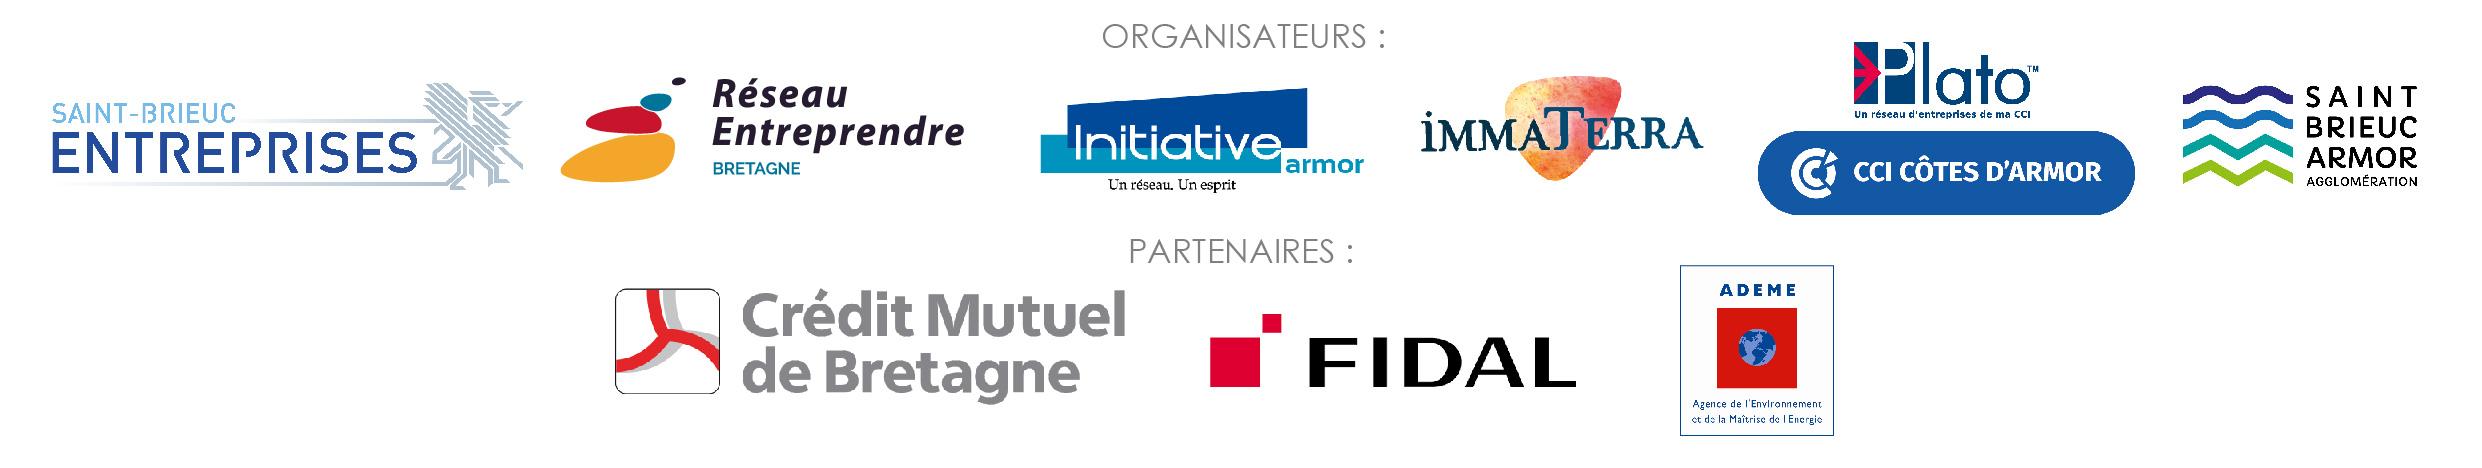 bandeau logos-confeco-entreprisedufutur-04032020